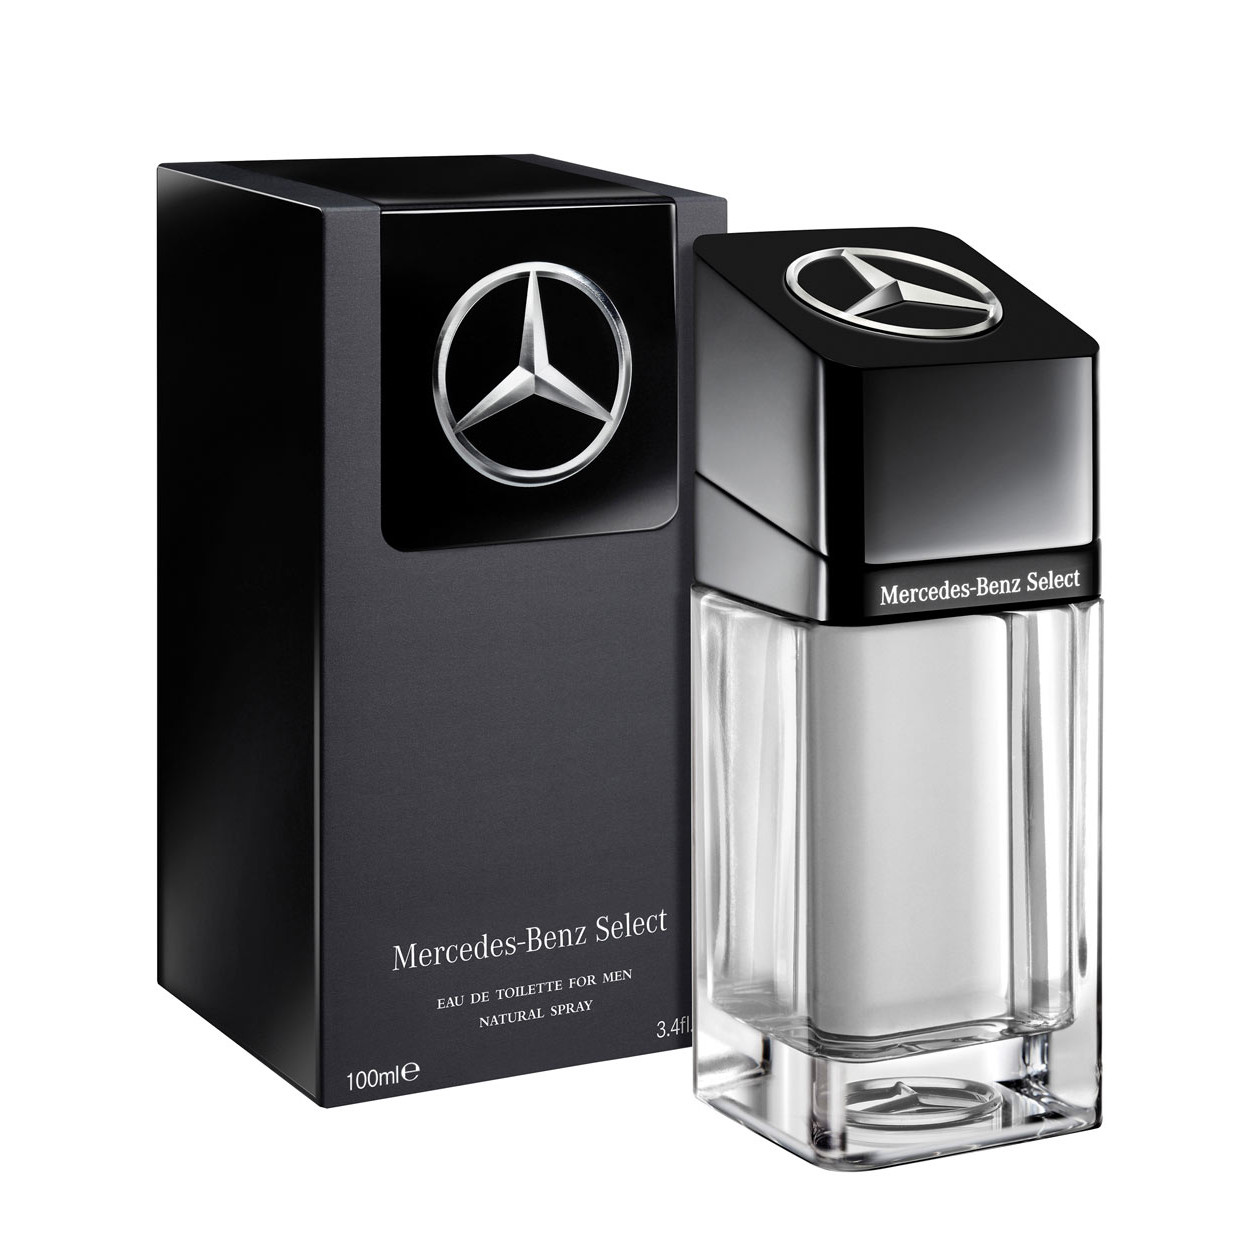 Mercedes Benz Select for Man - toaletní voda M Objem: 100 ml